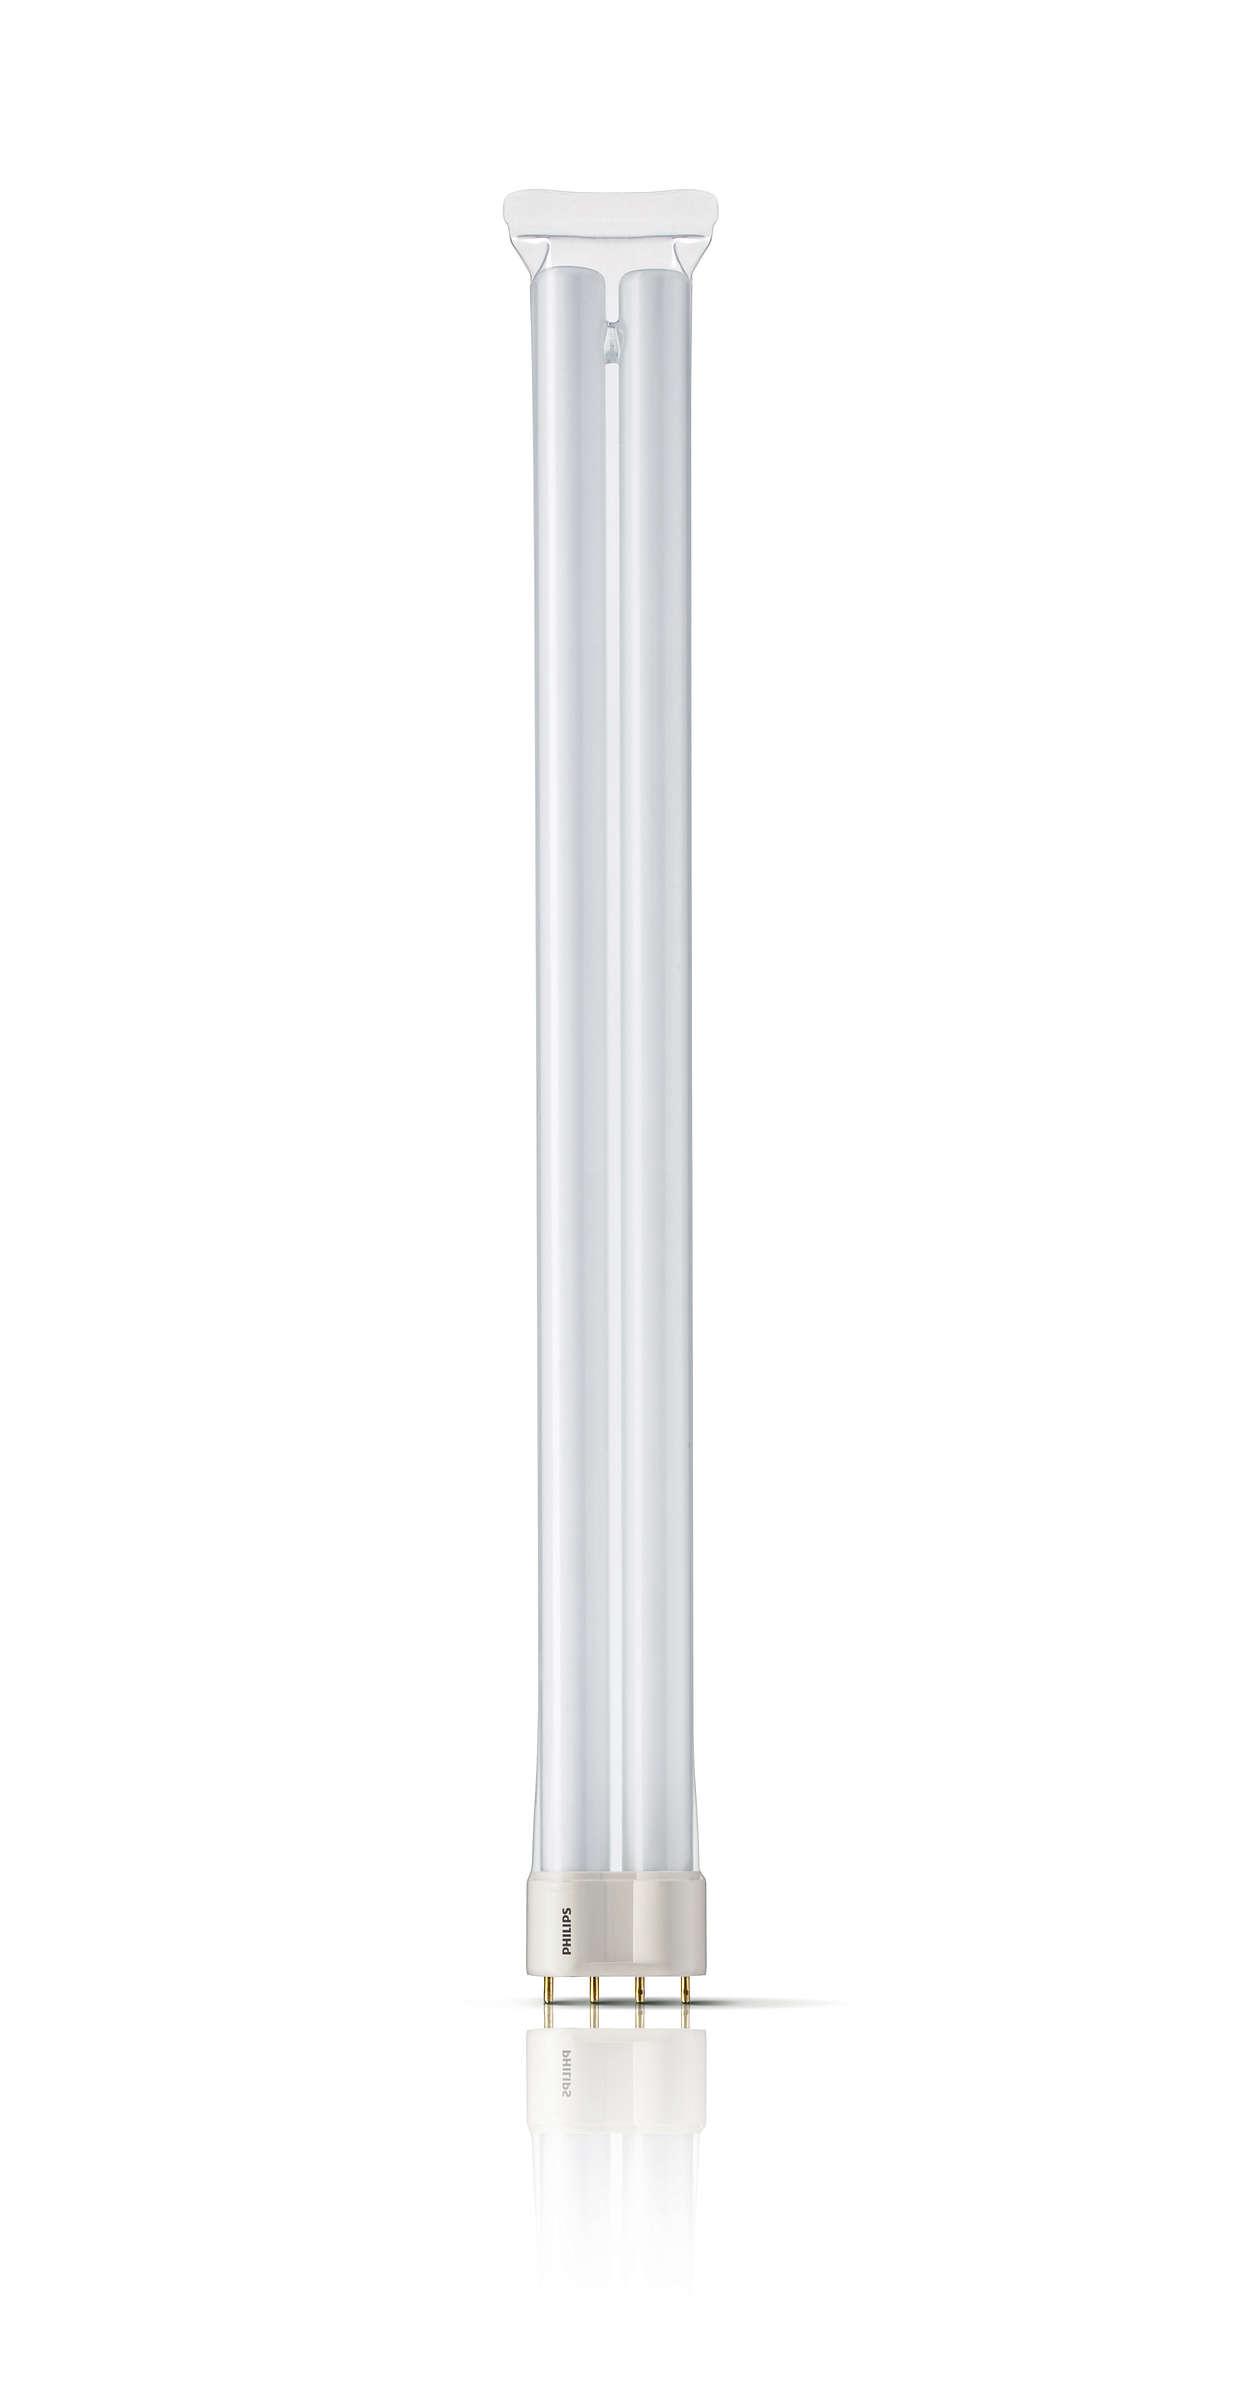 PL-L /10 UV-A